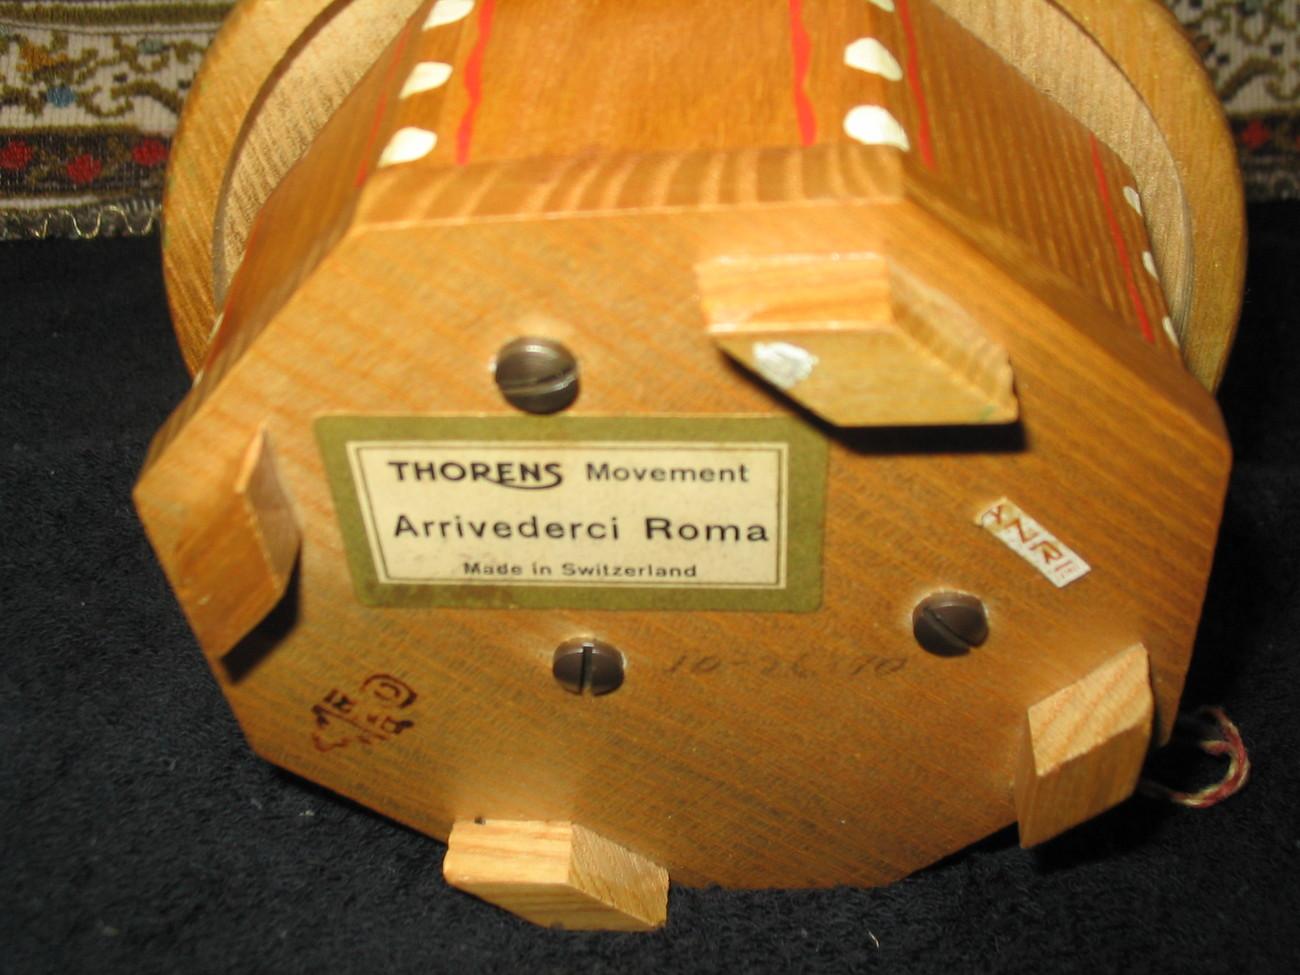 Anri Music Box Thorens Swiss Arriverderci Roma